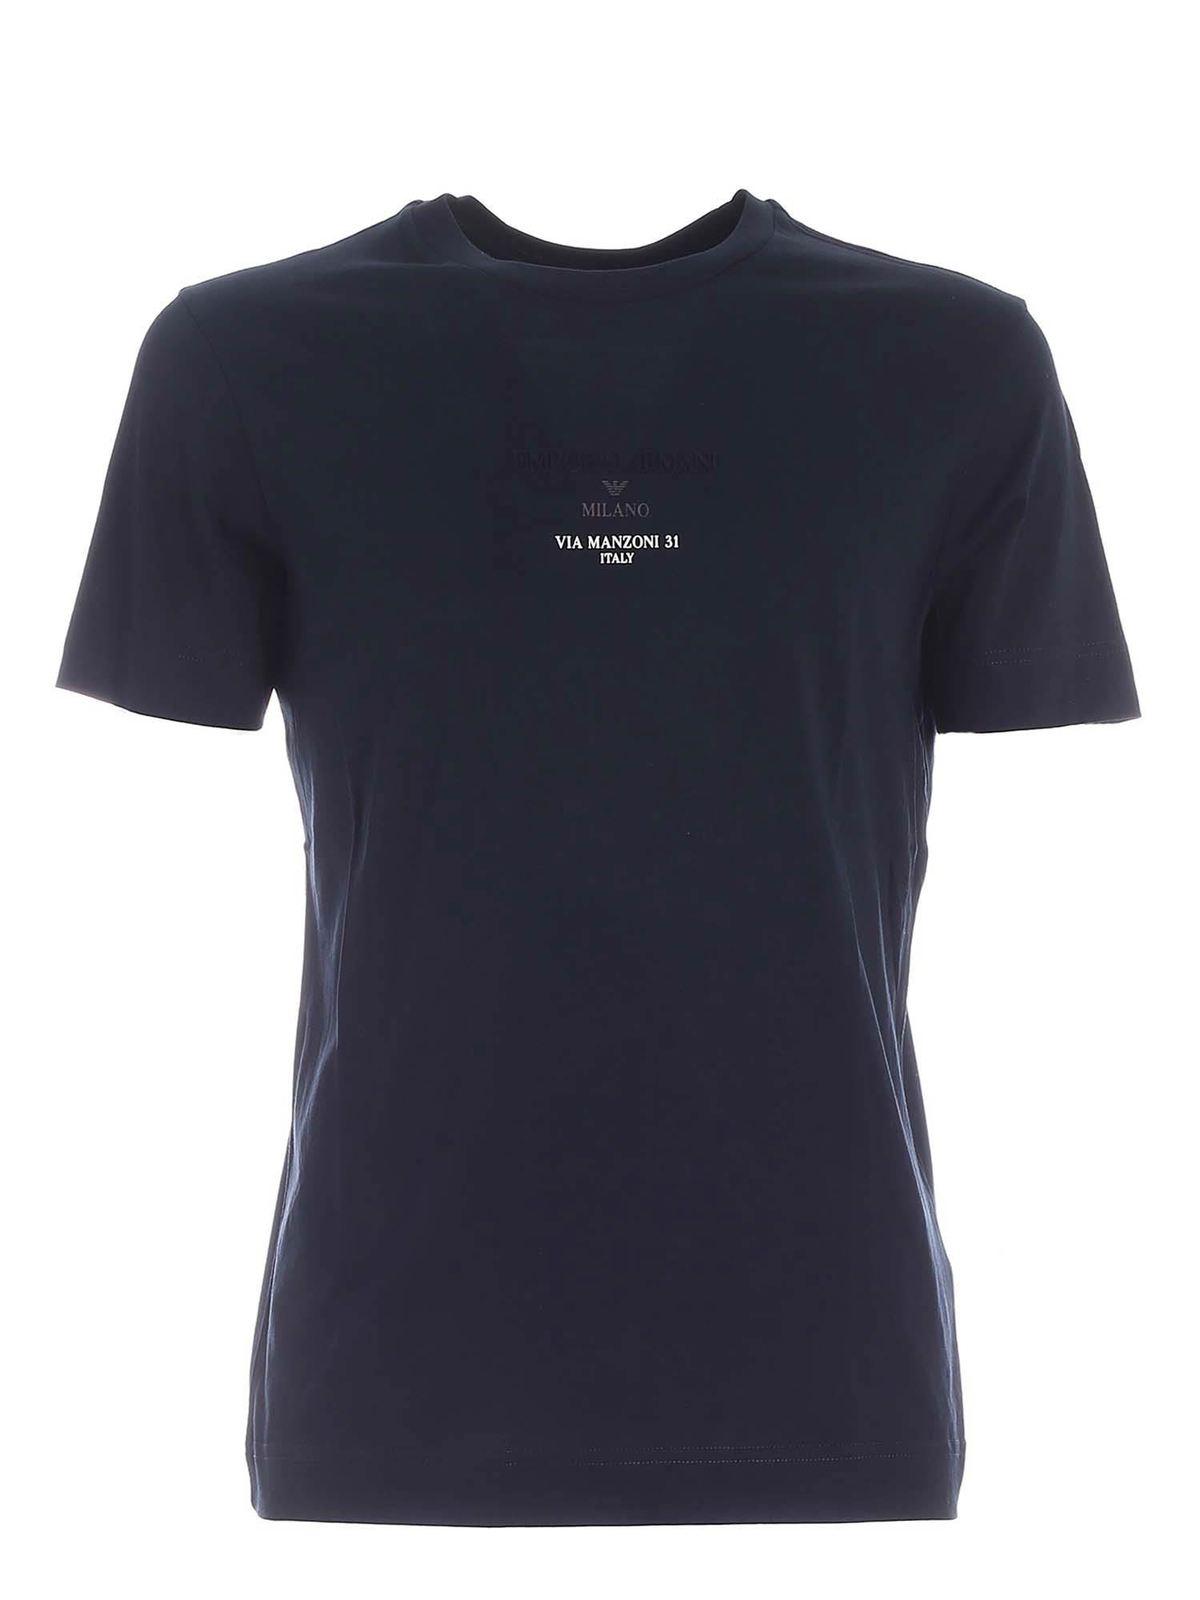 Emporio Armani LOGO PRINT T-SHIRT IN BLUE